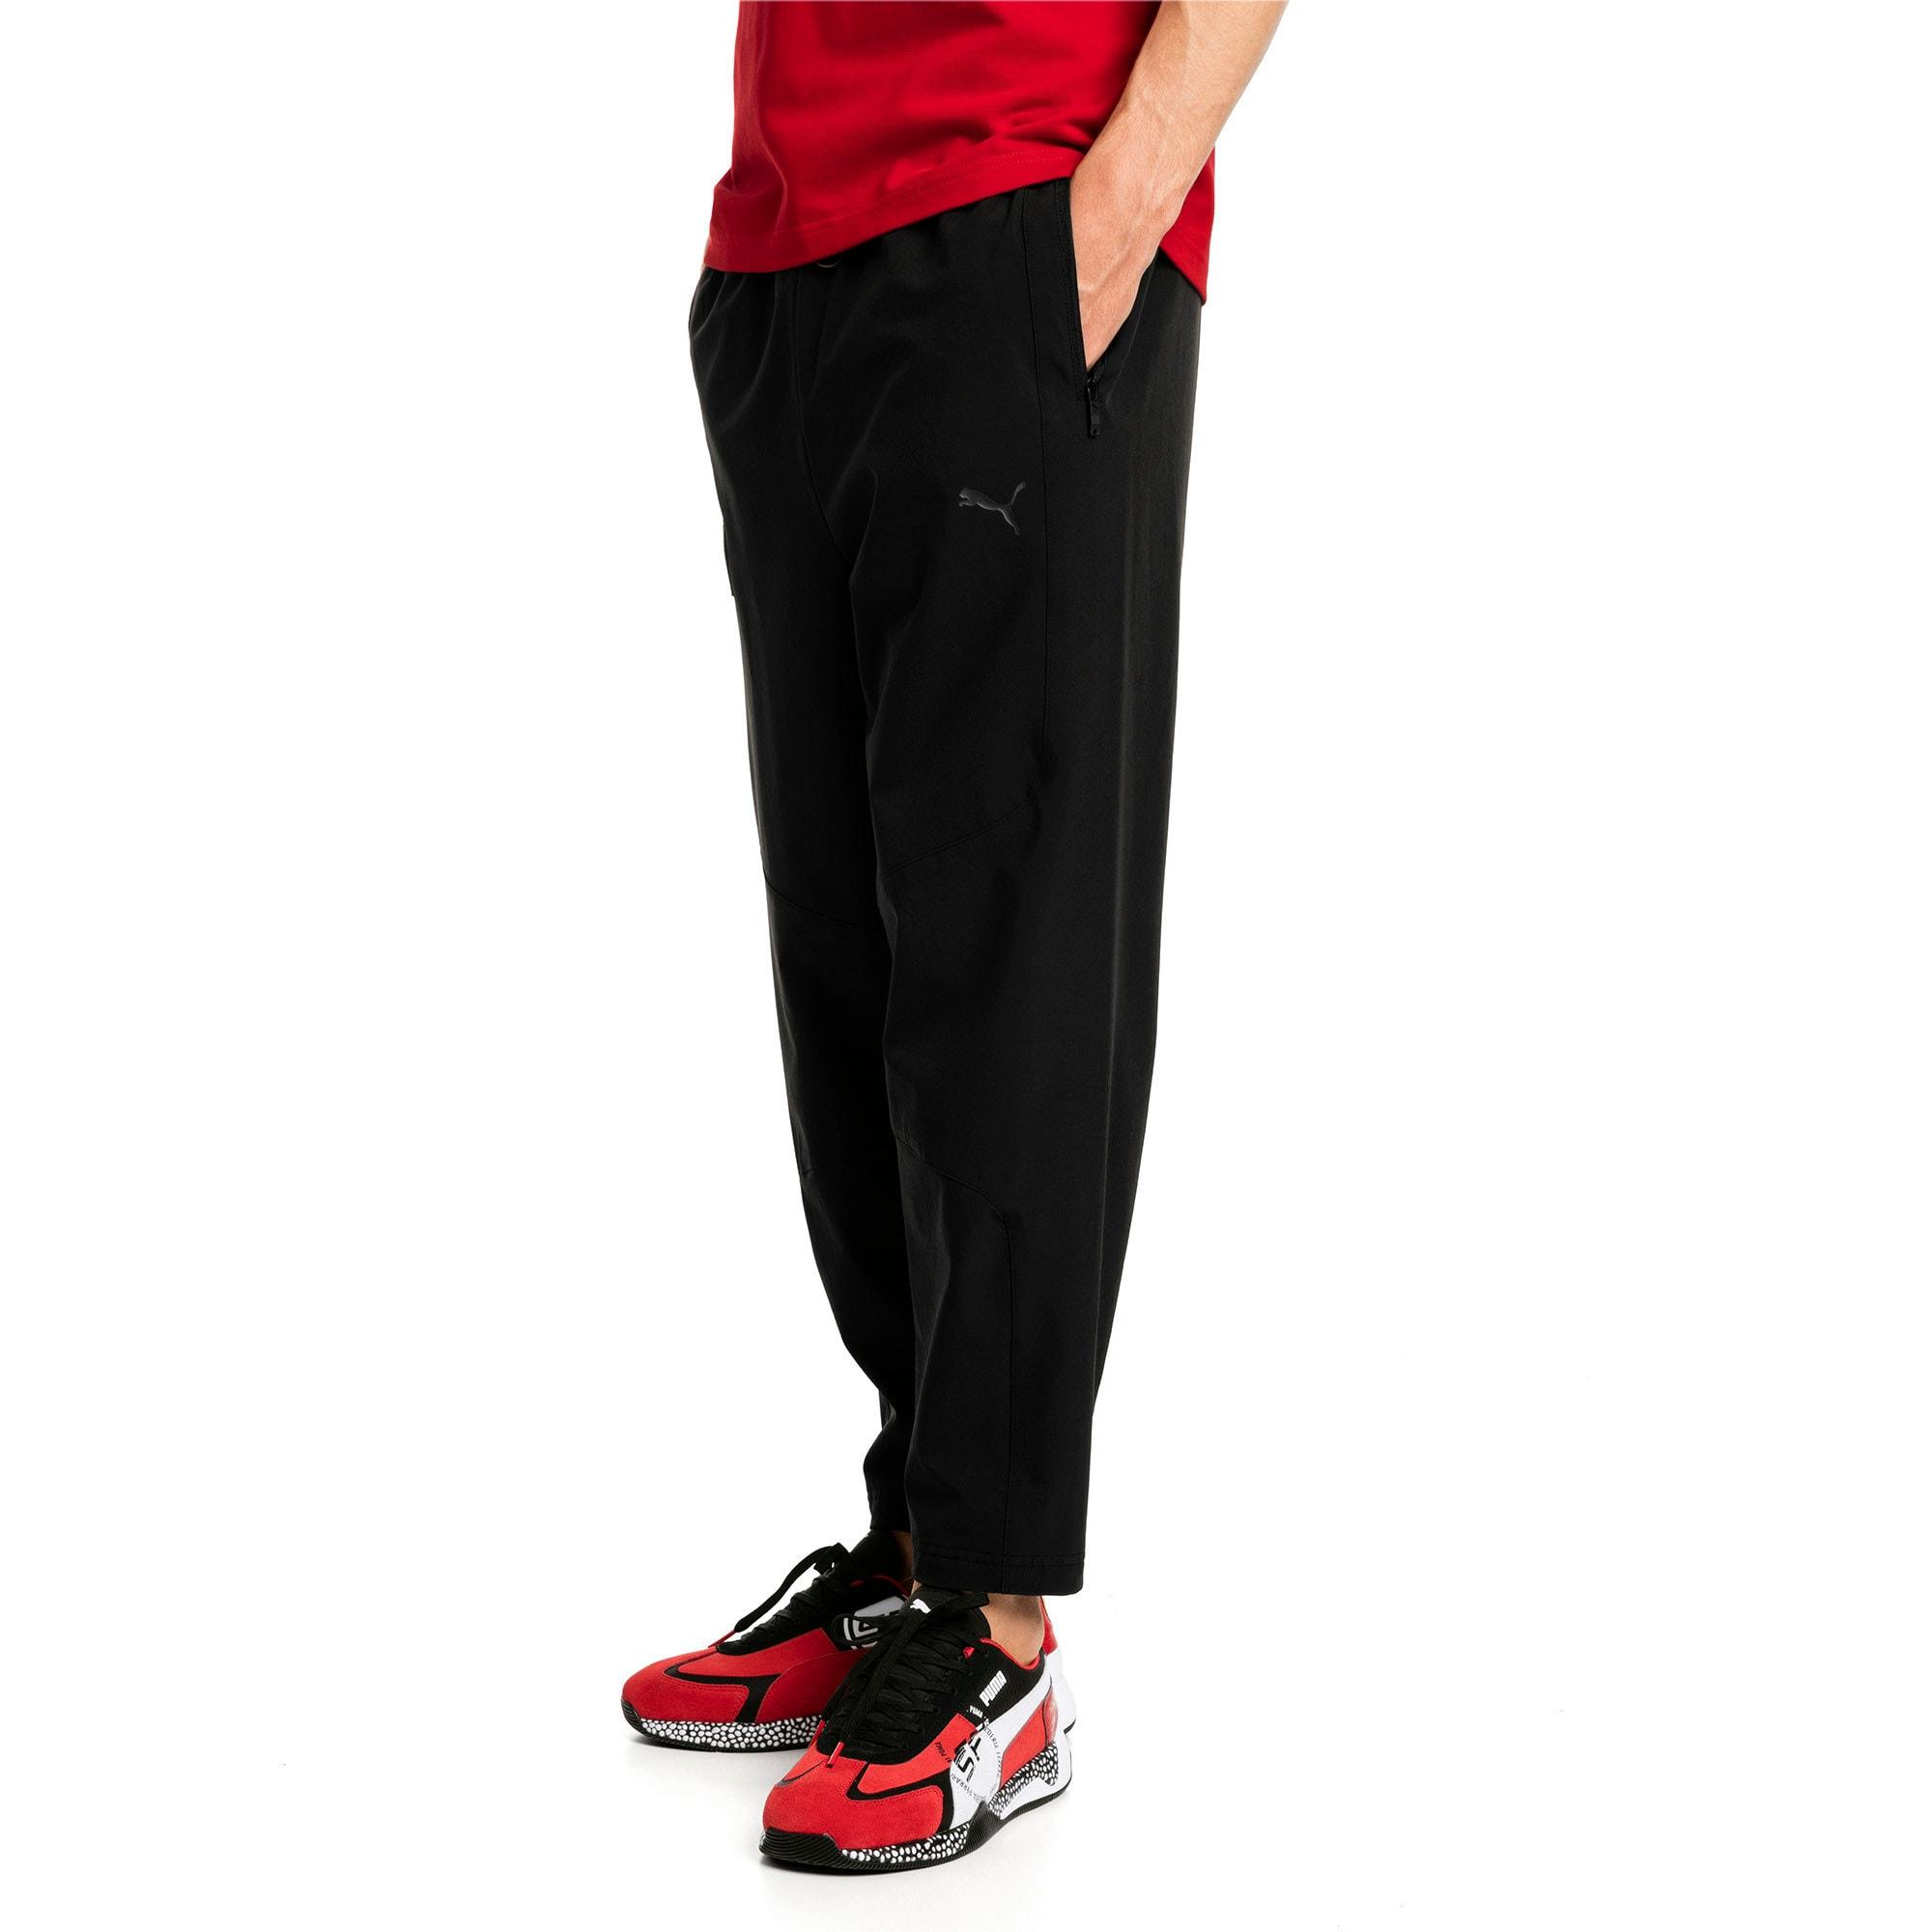 Thumbnail 1 of Scuderia Ferrari Life Men's Sweatpants, Puma Black, medium